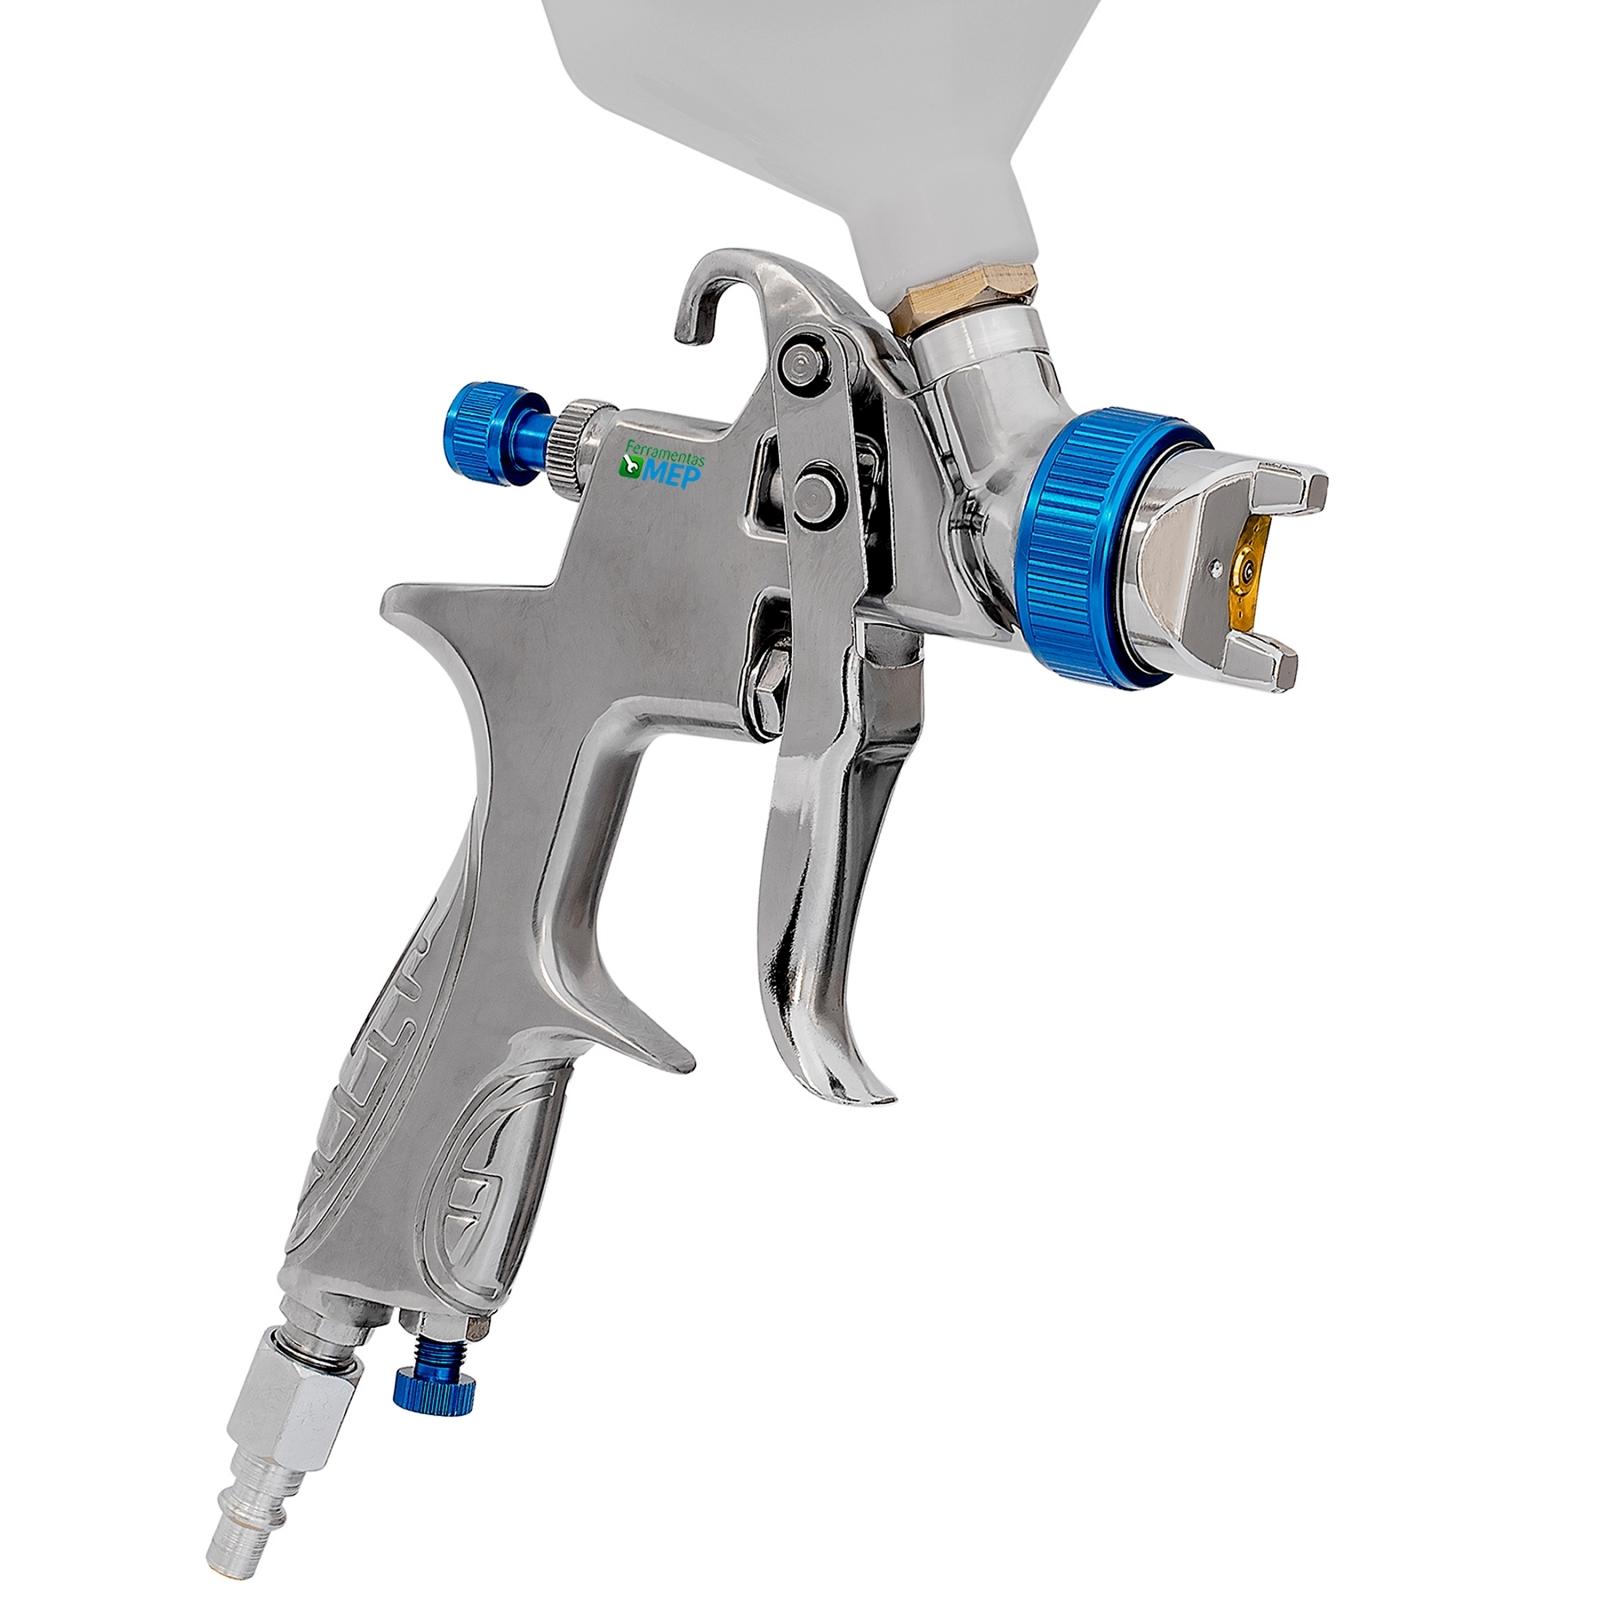 Pistola De Pintura HVLP Ldr2 Pro 530  Bico 1,3mm - Ferramentas MEP